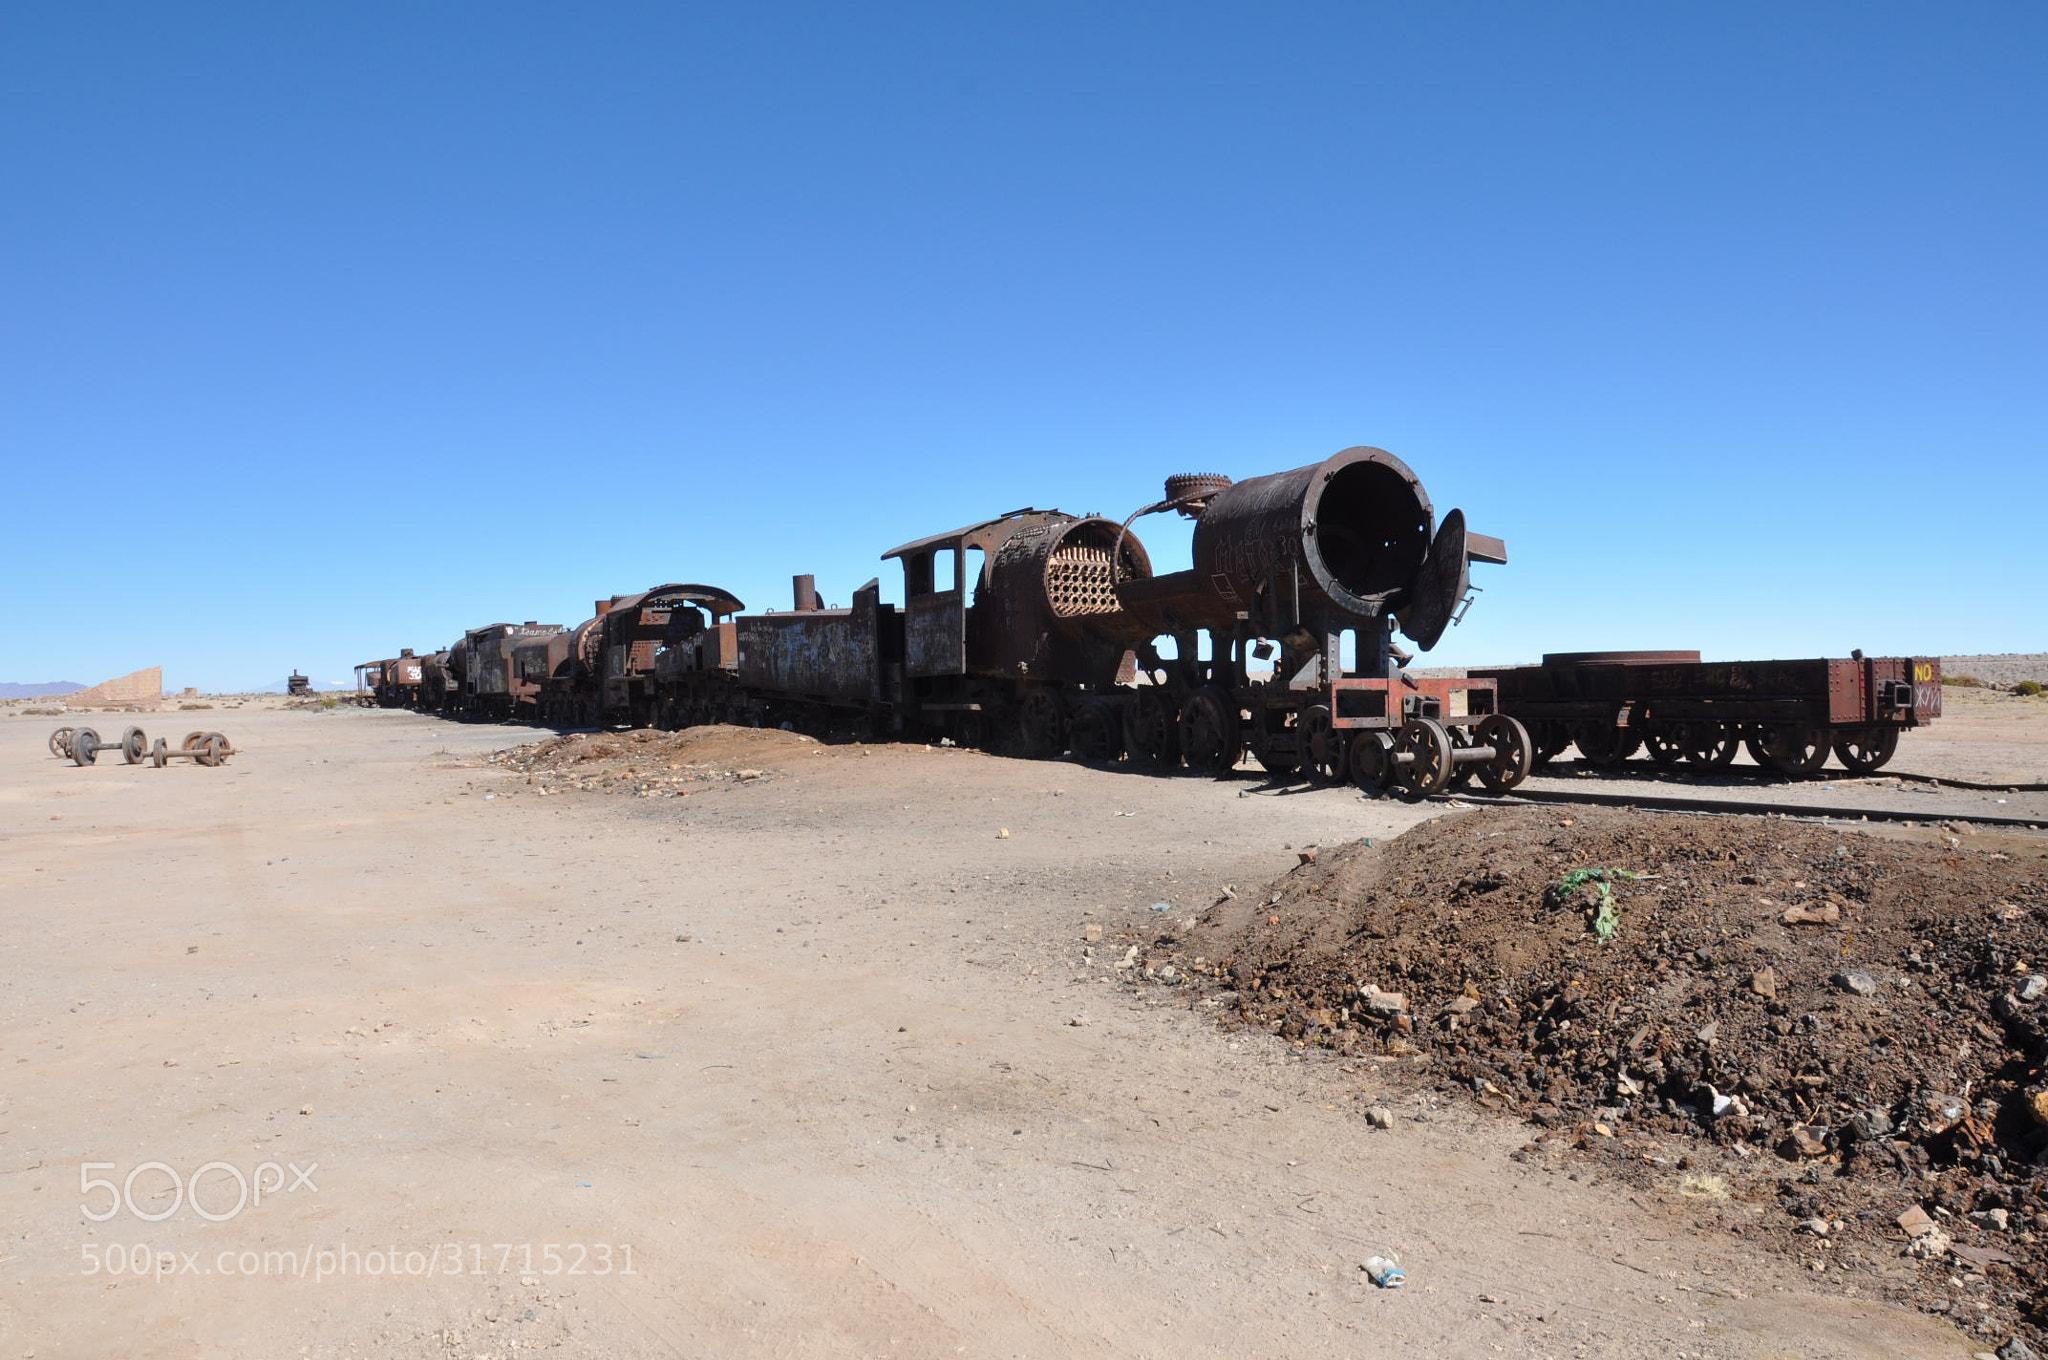 Photograph Uyuni, Bolivia by Mia Paduan on 500px